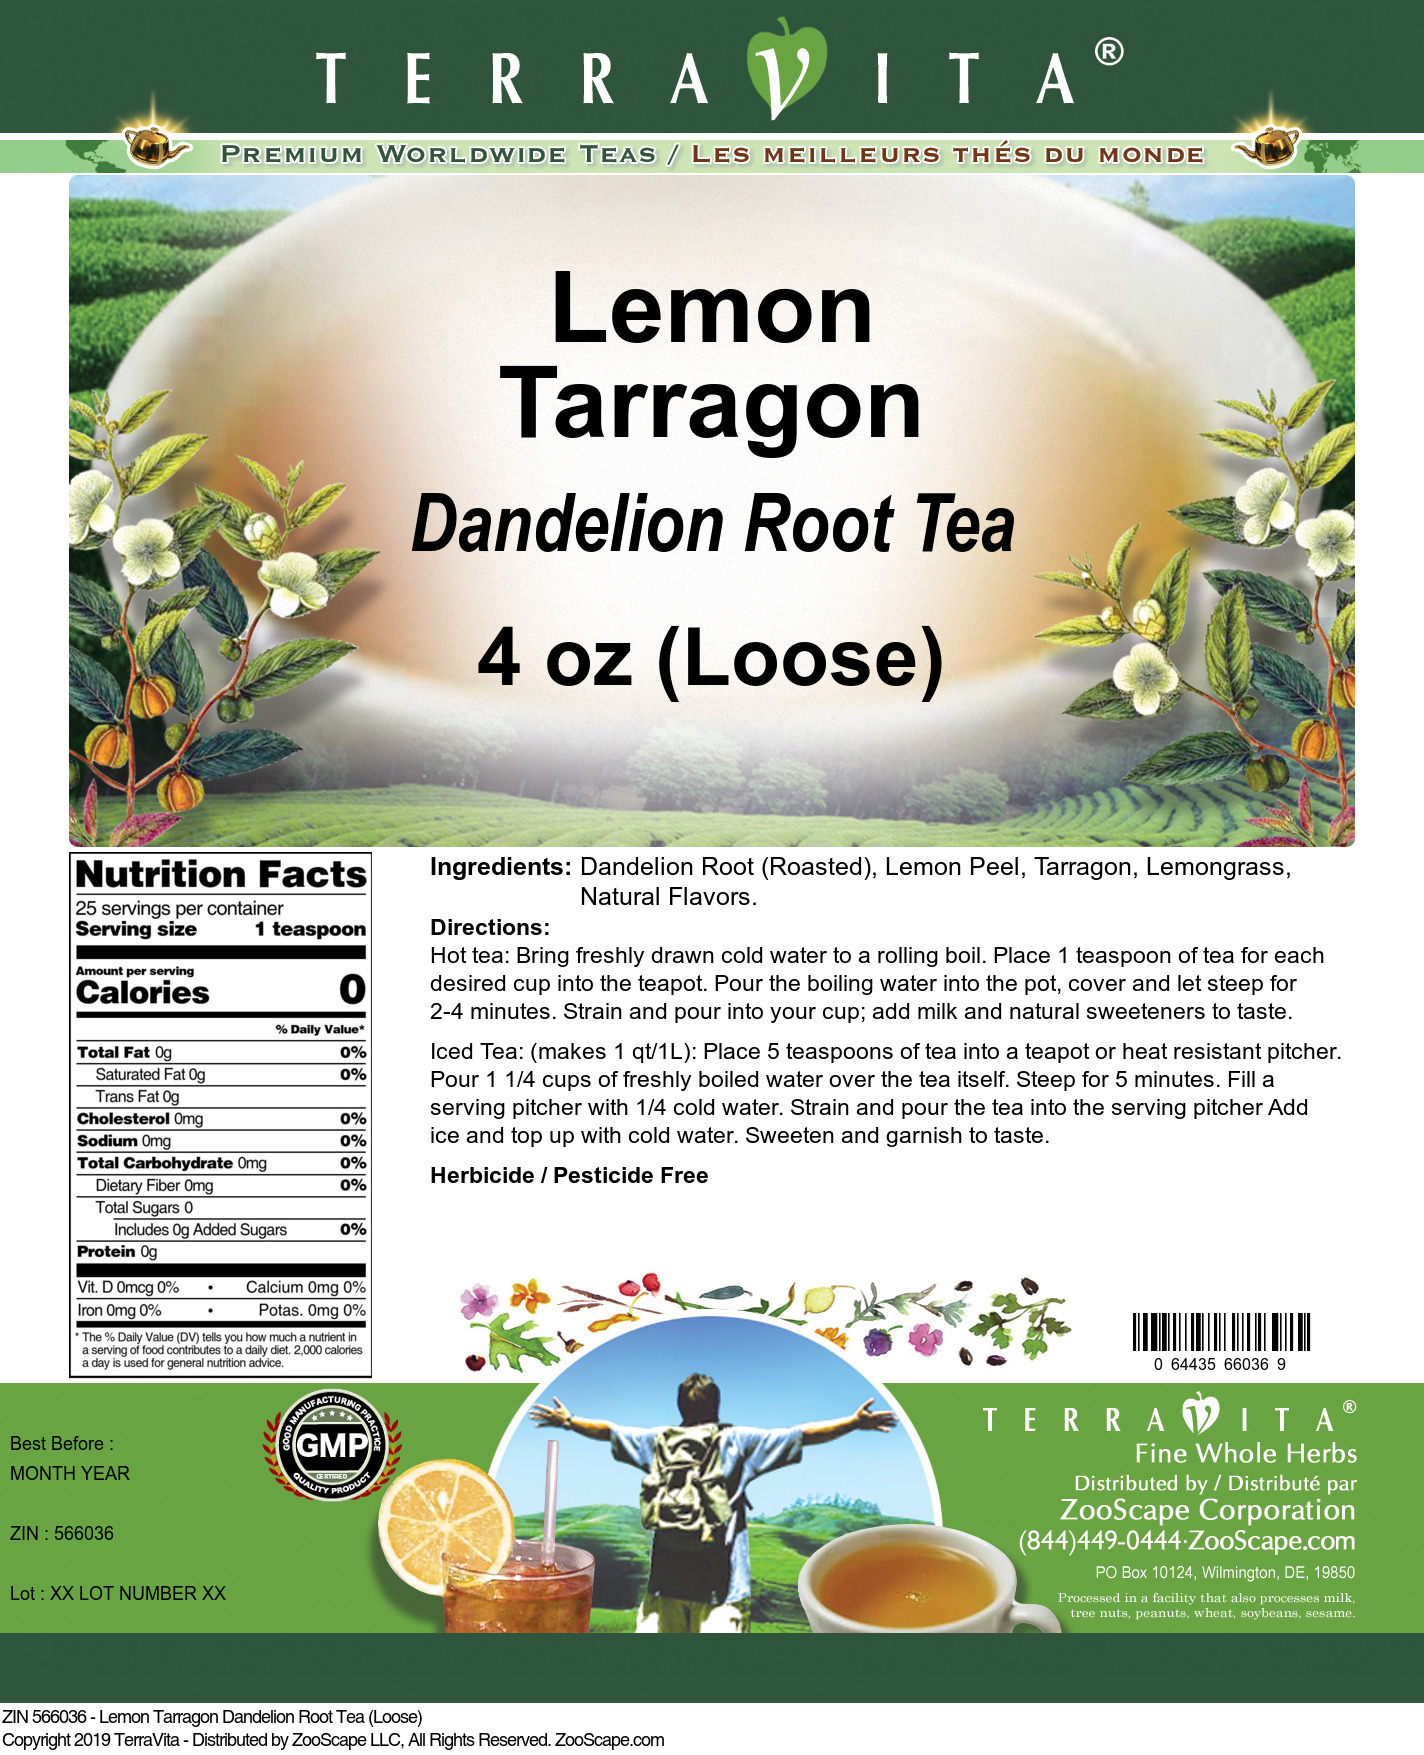 Lemon Tarragon Dandelion Root